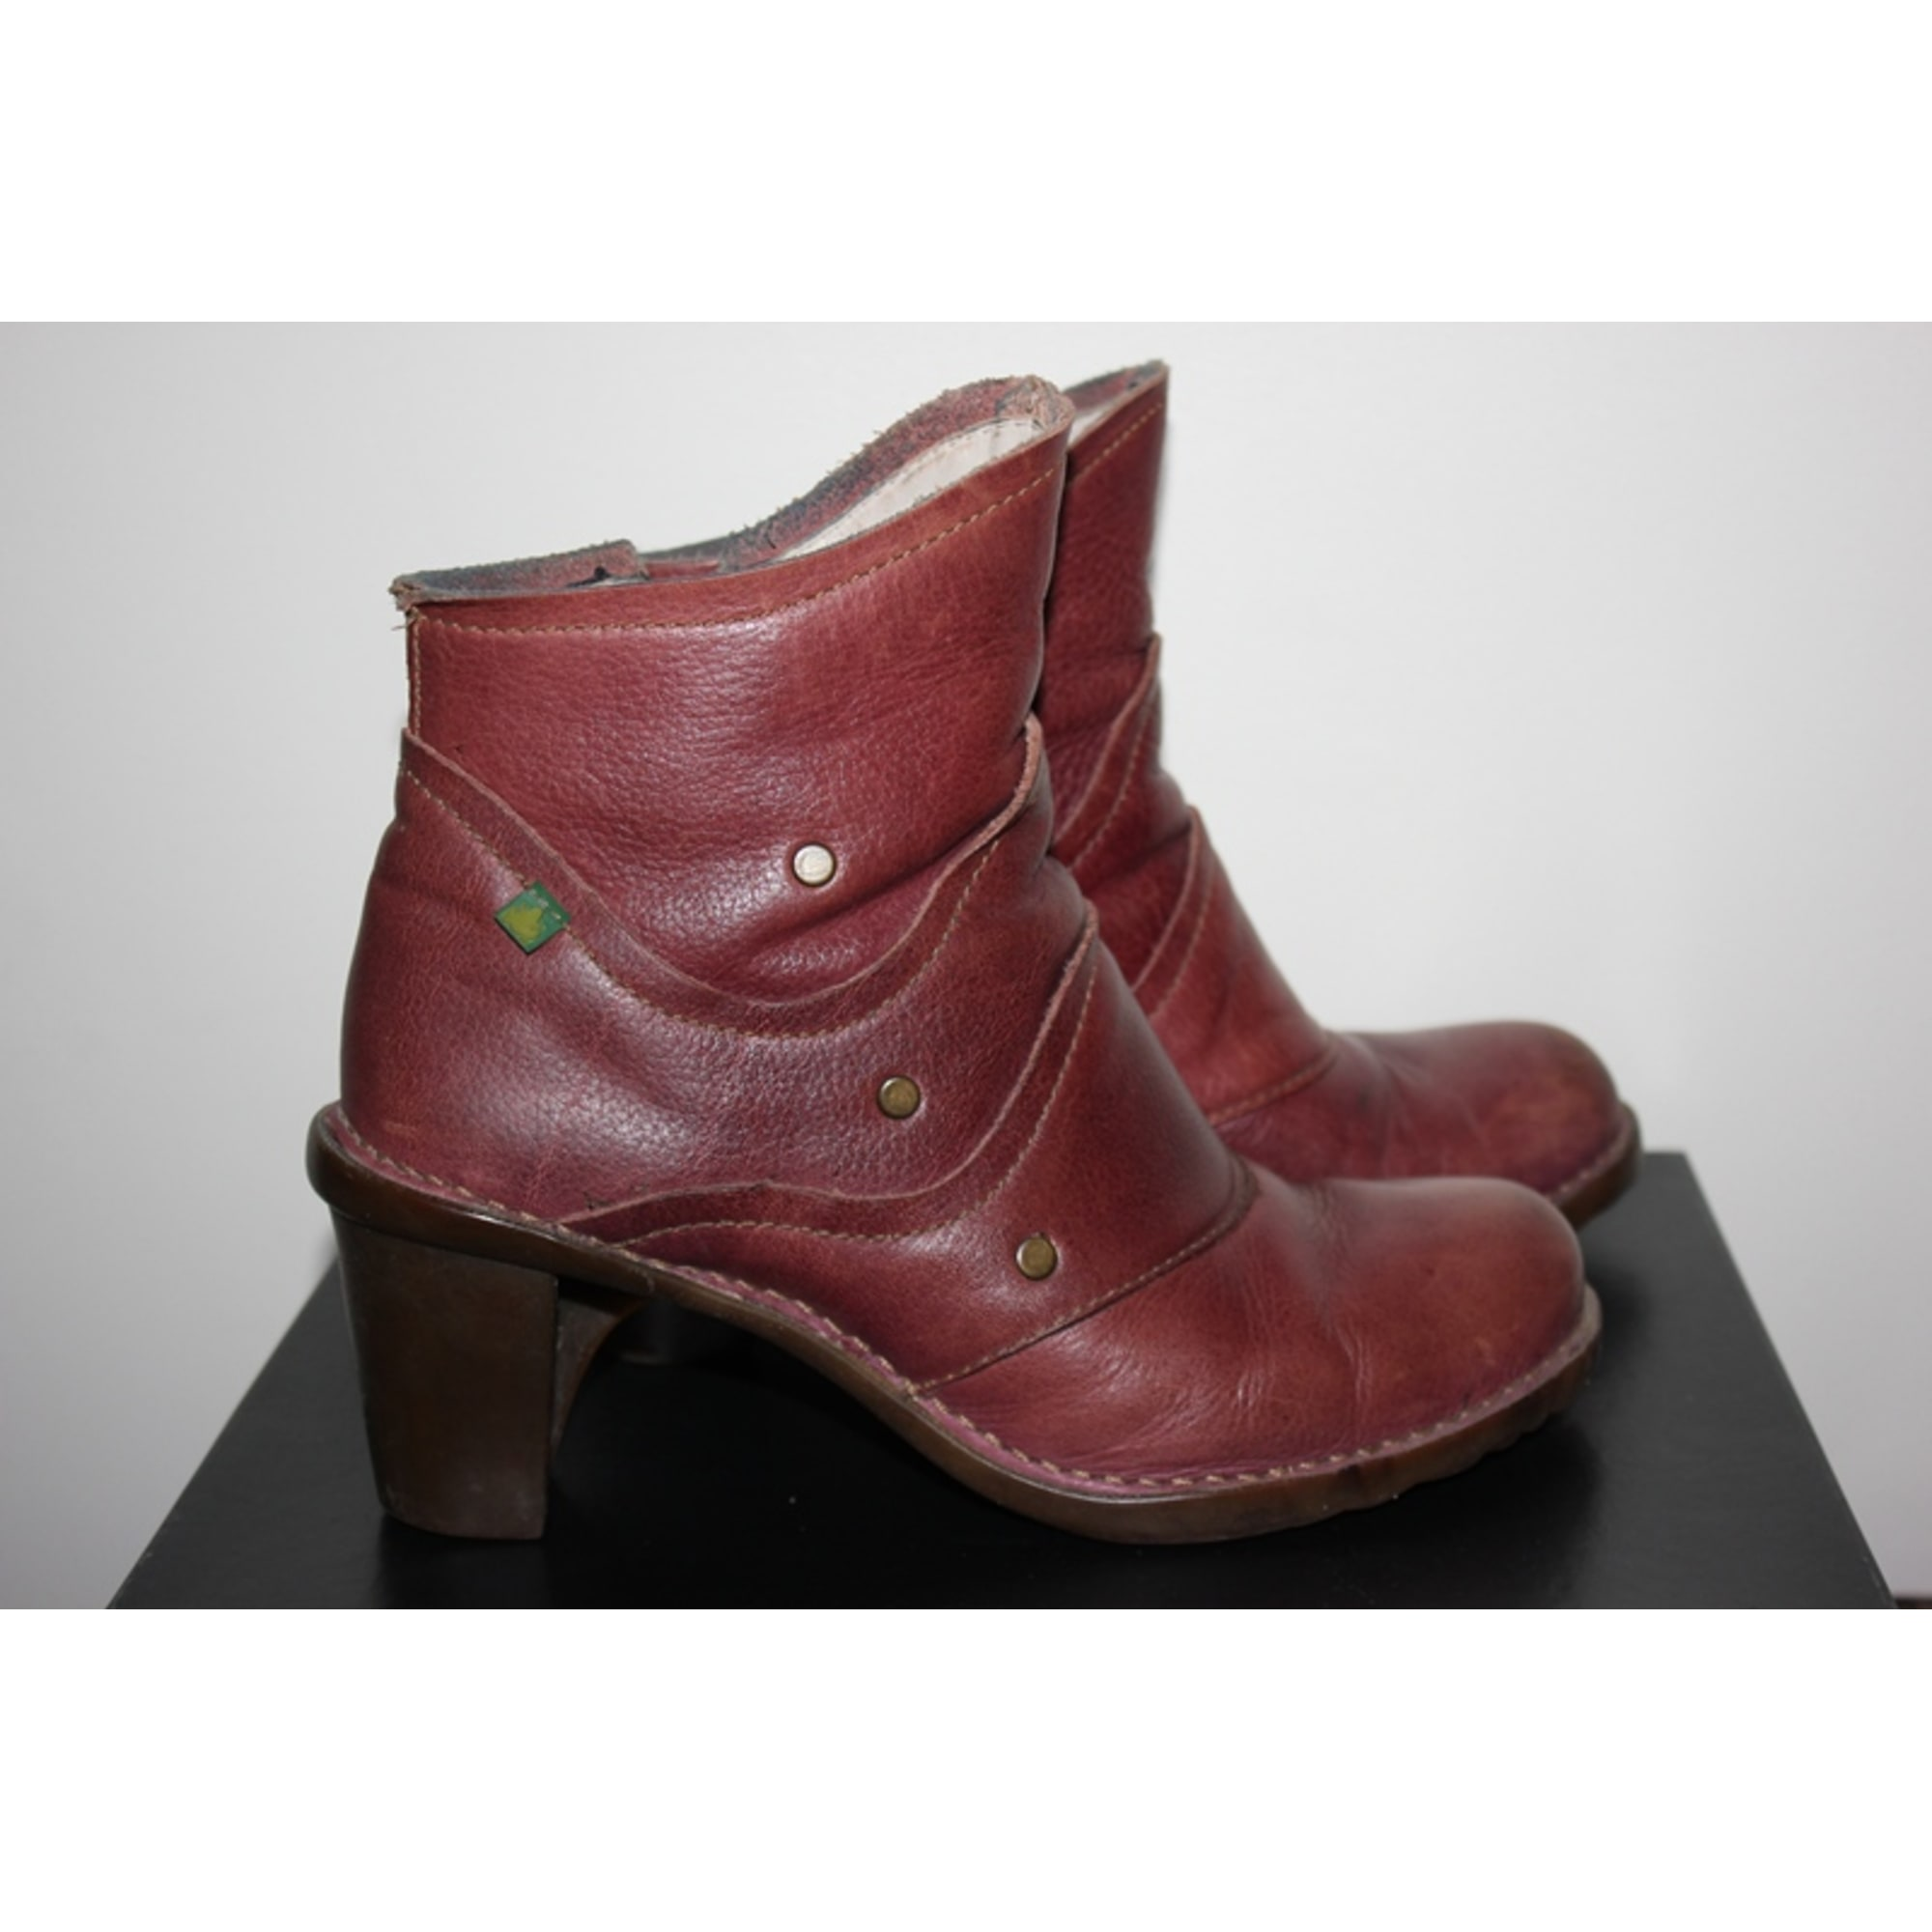 Boots Par Violet 39 El amp; Vendu Talons À Naturalista Low Bottines ZwpEqnB